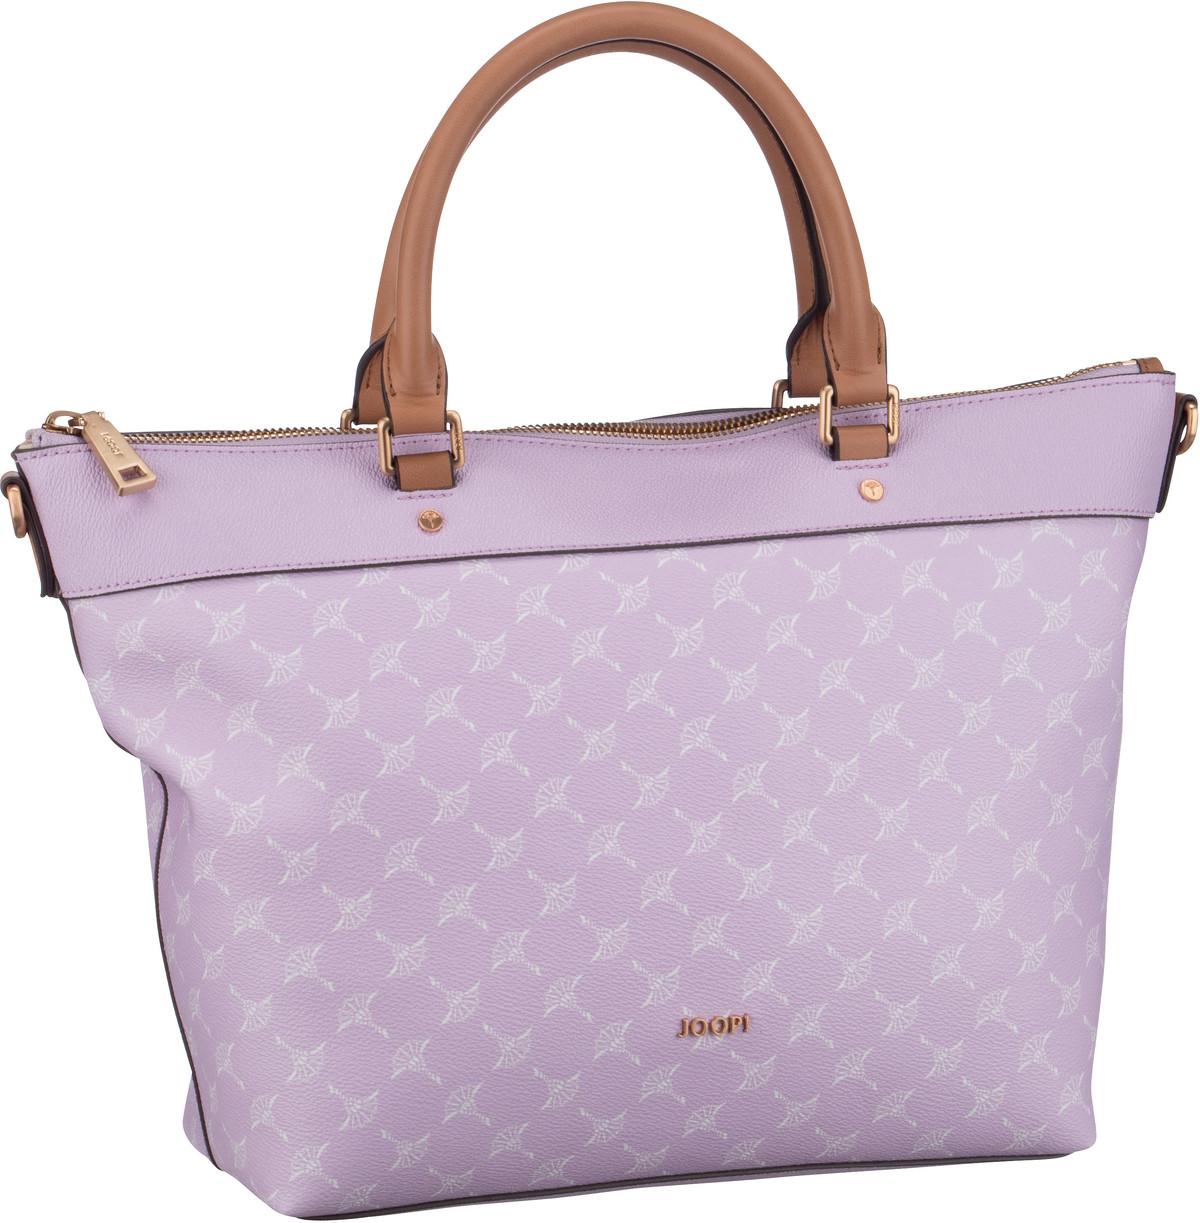 Handtasche Thoosa Cortina Handbag Small Lavender